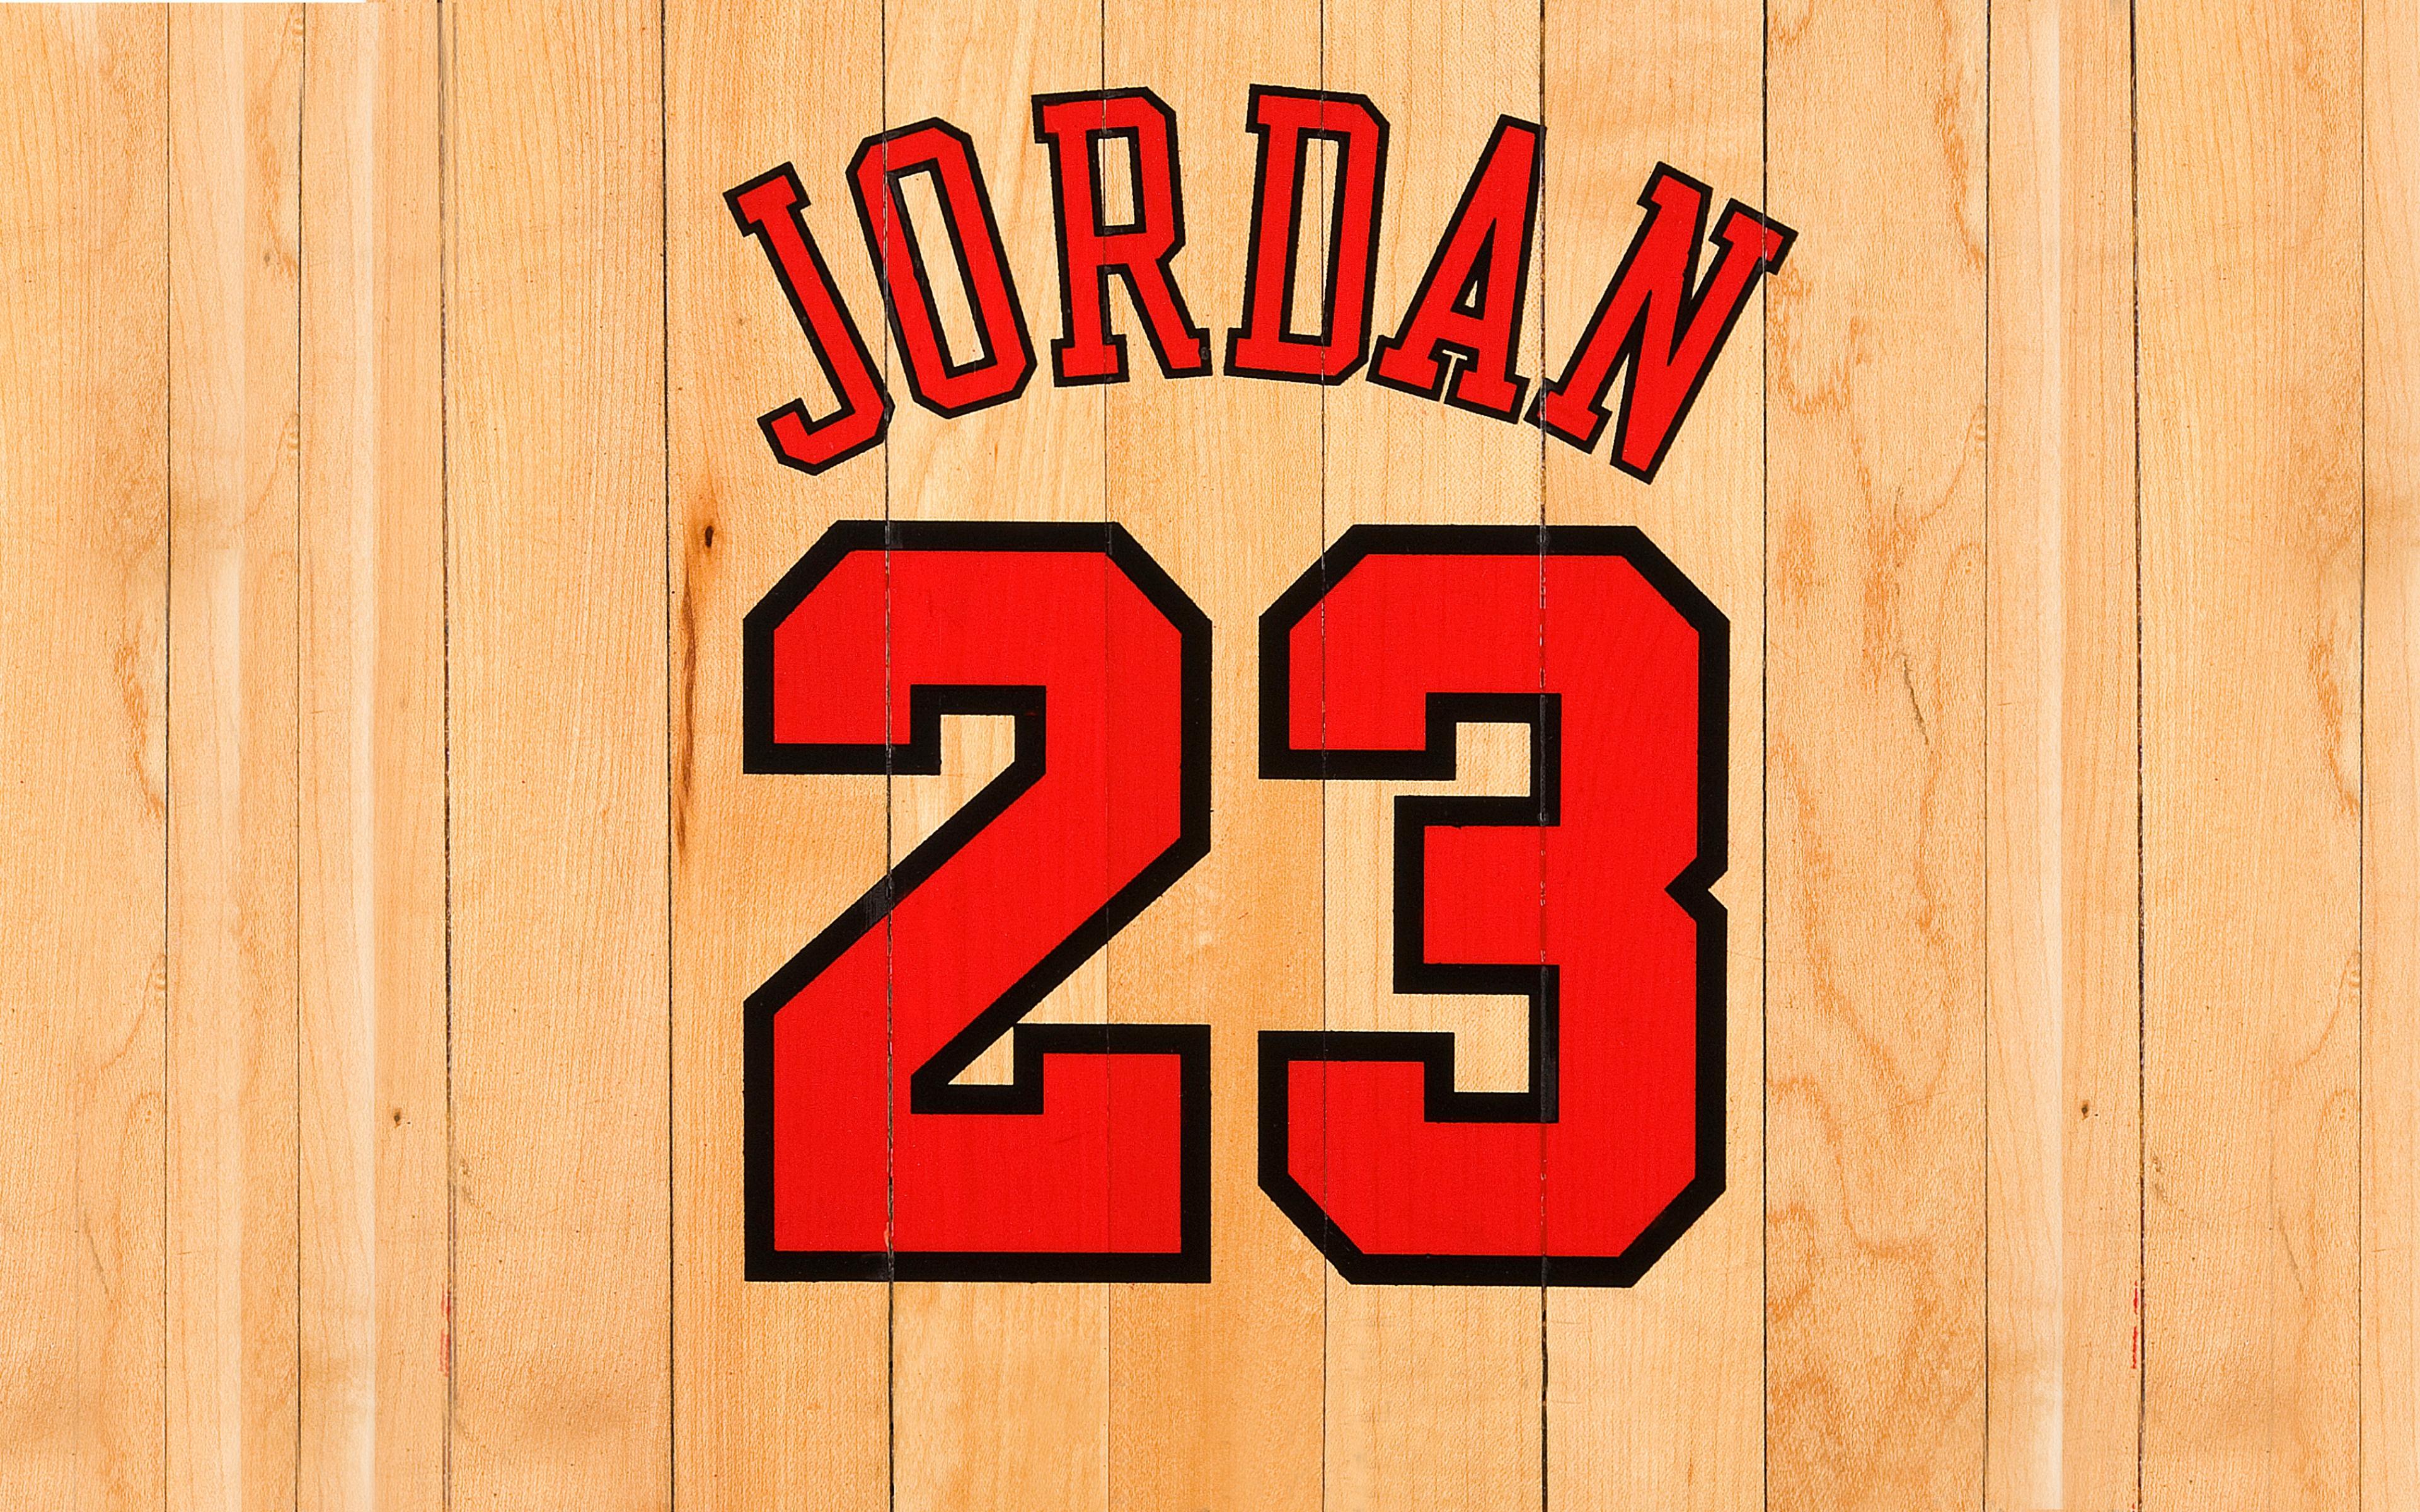 jordan Chicago bulls Number Name Nba Basketball Boards Wallpaper 3840x2400